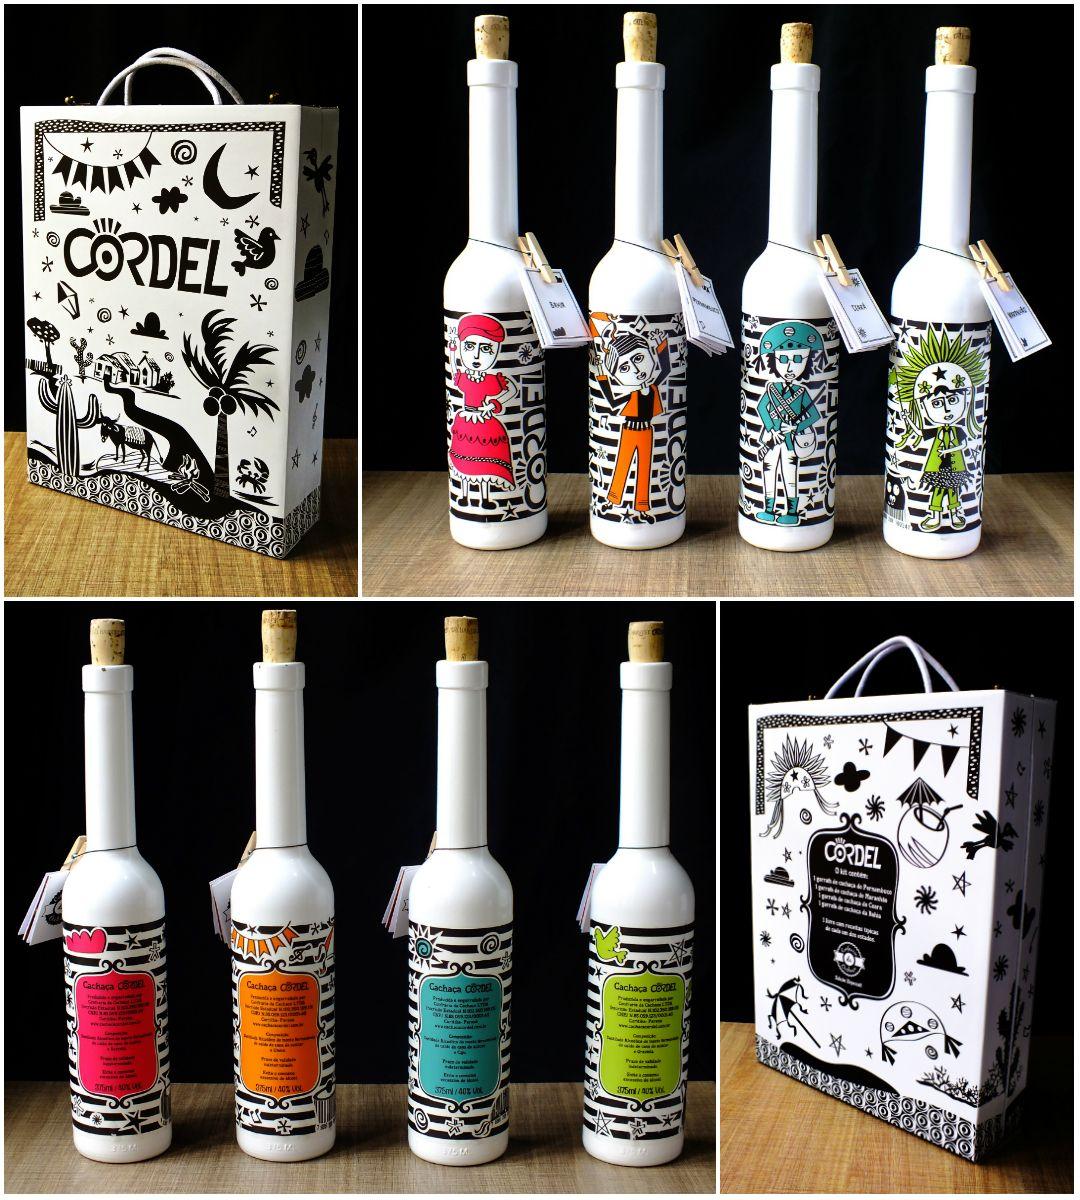 Trabalho Acadêmico - Cachaça Cordel http://www.behance.net/gallery/Trabalho-Academico-Cachaca-Cordel/12999929 #design #cordel #illustration #nordeste #garrafa #brasil #package #embalagem #beverage #branding #packaging #design #creative #marketing #packages